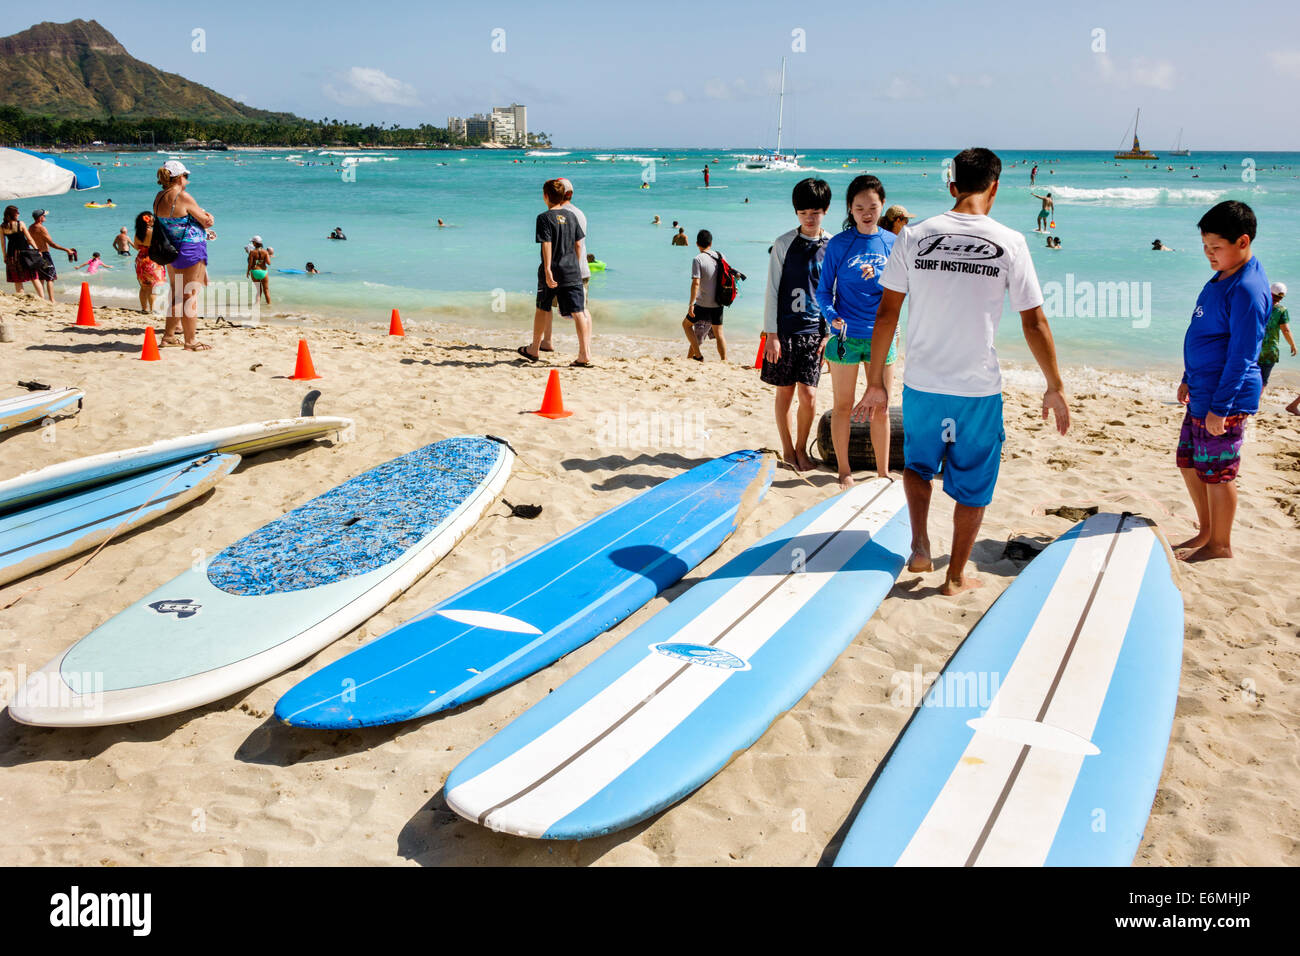 Waikiki Beach Honolulu Hawaii Hawaiian Oahu Pacific Ocean Waterfront Sunbathers Surfboard Surfer Surfing Lesson Asian Boy Girl Teen Diamond